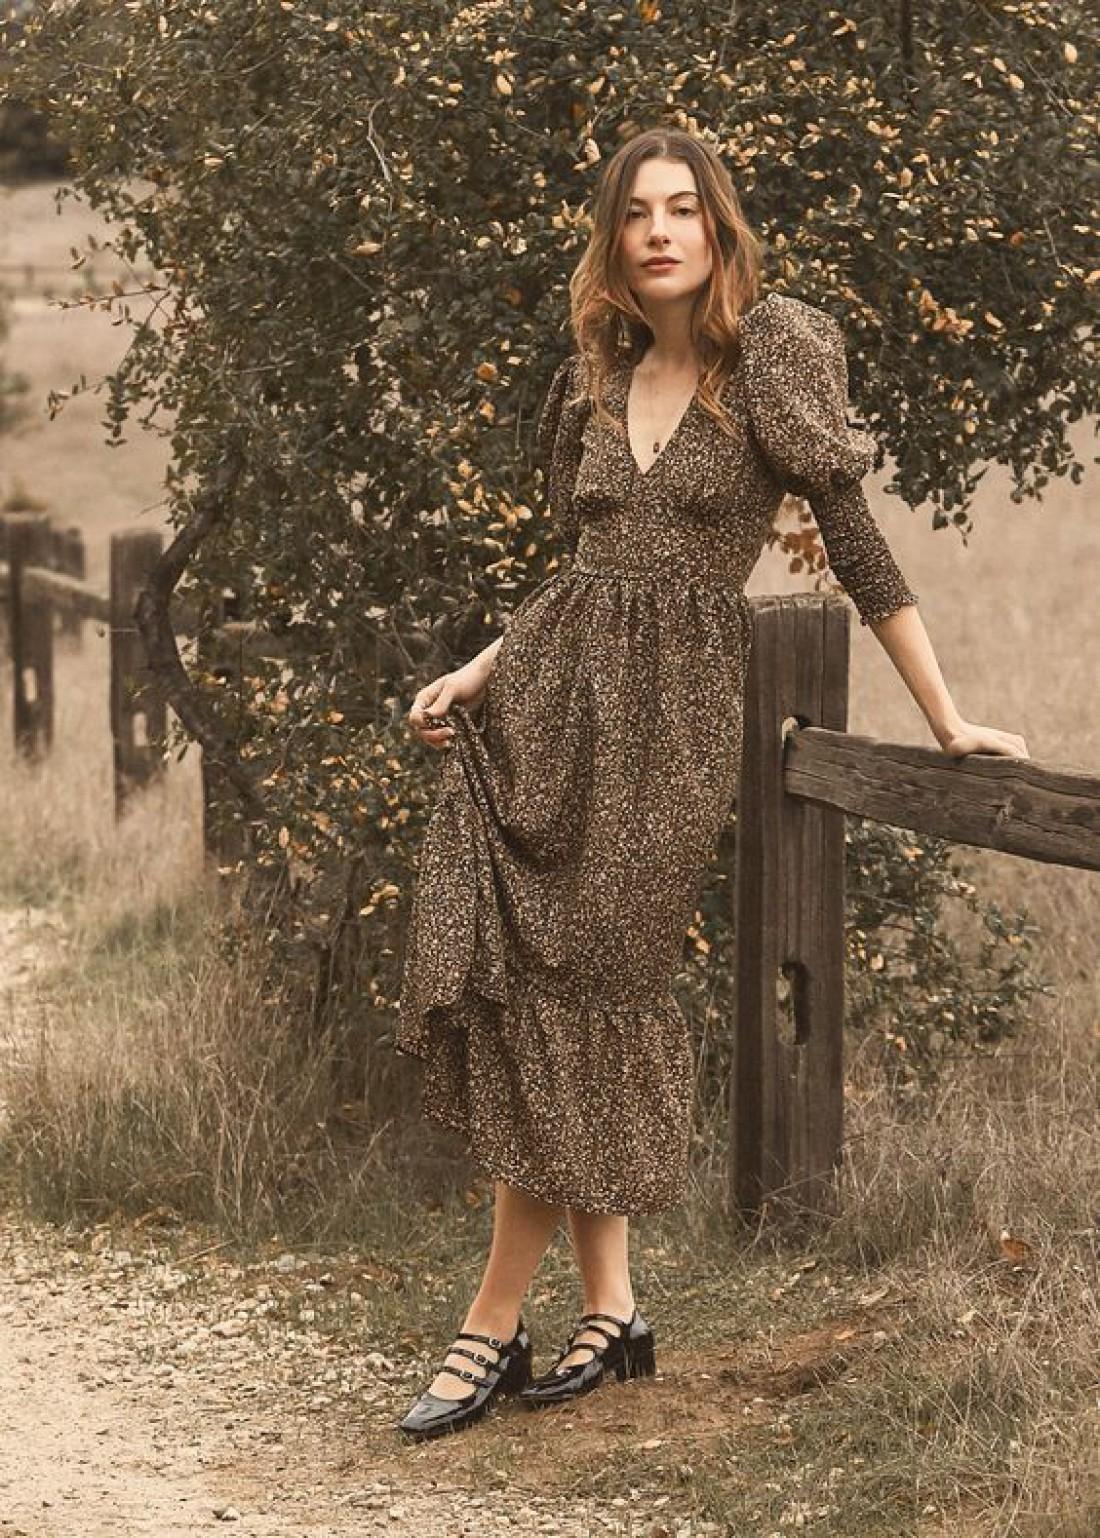 Модная одежда 2019: нотки феминизма, бахрома и носки под босоножки